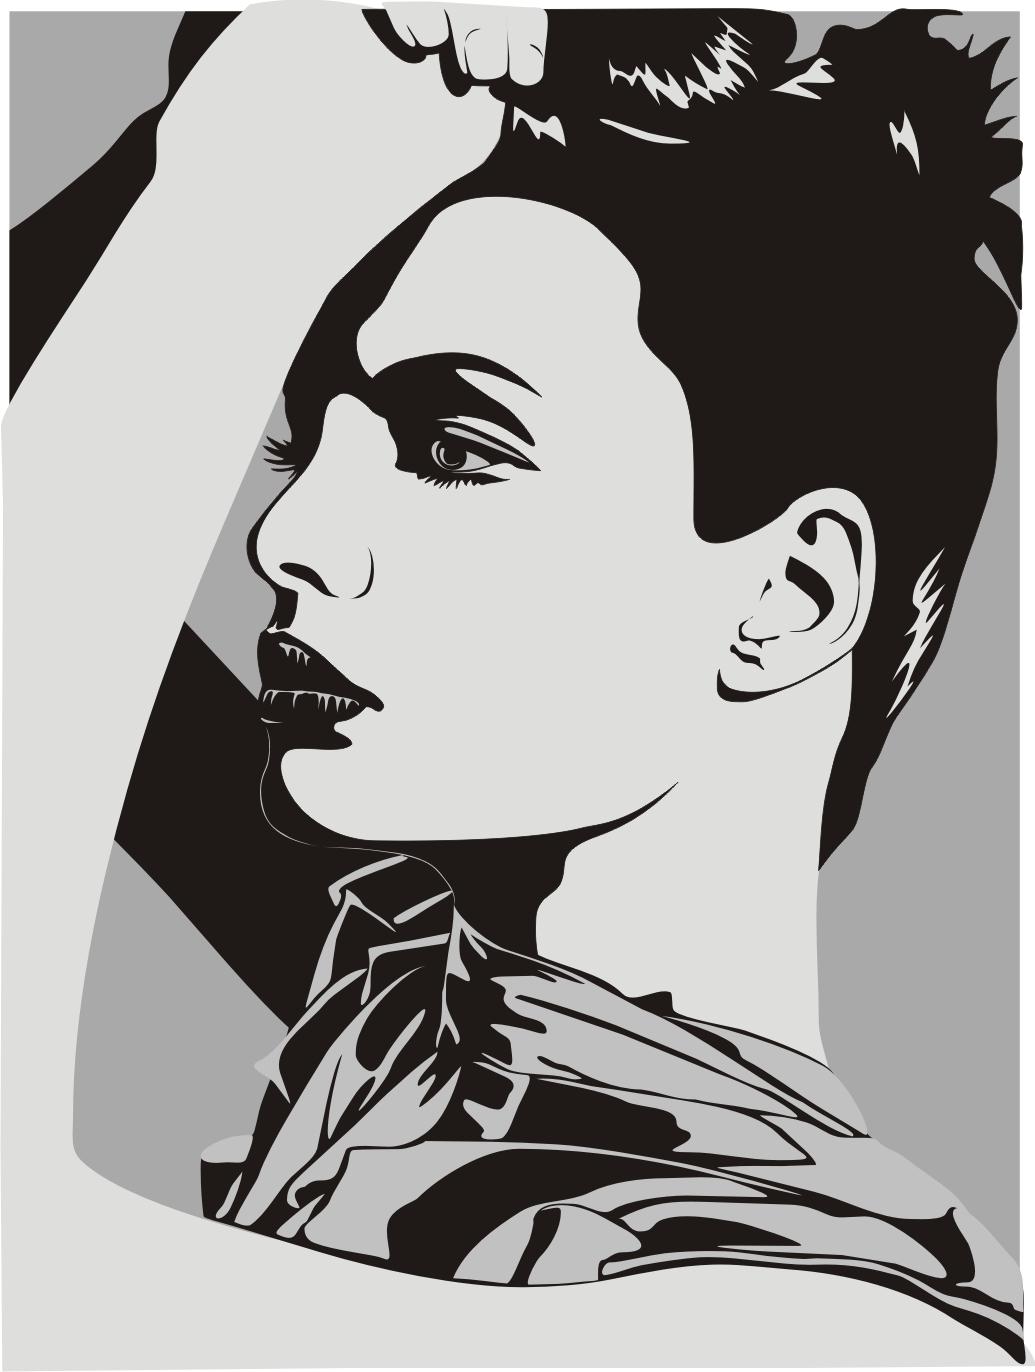 Female Clip Art Silhouette m8 Free CDR Vectors Art